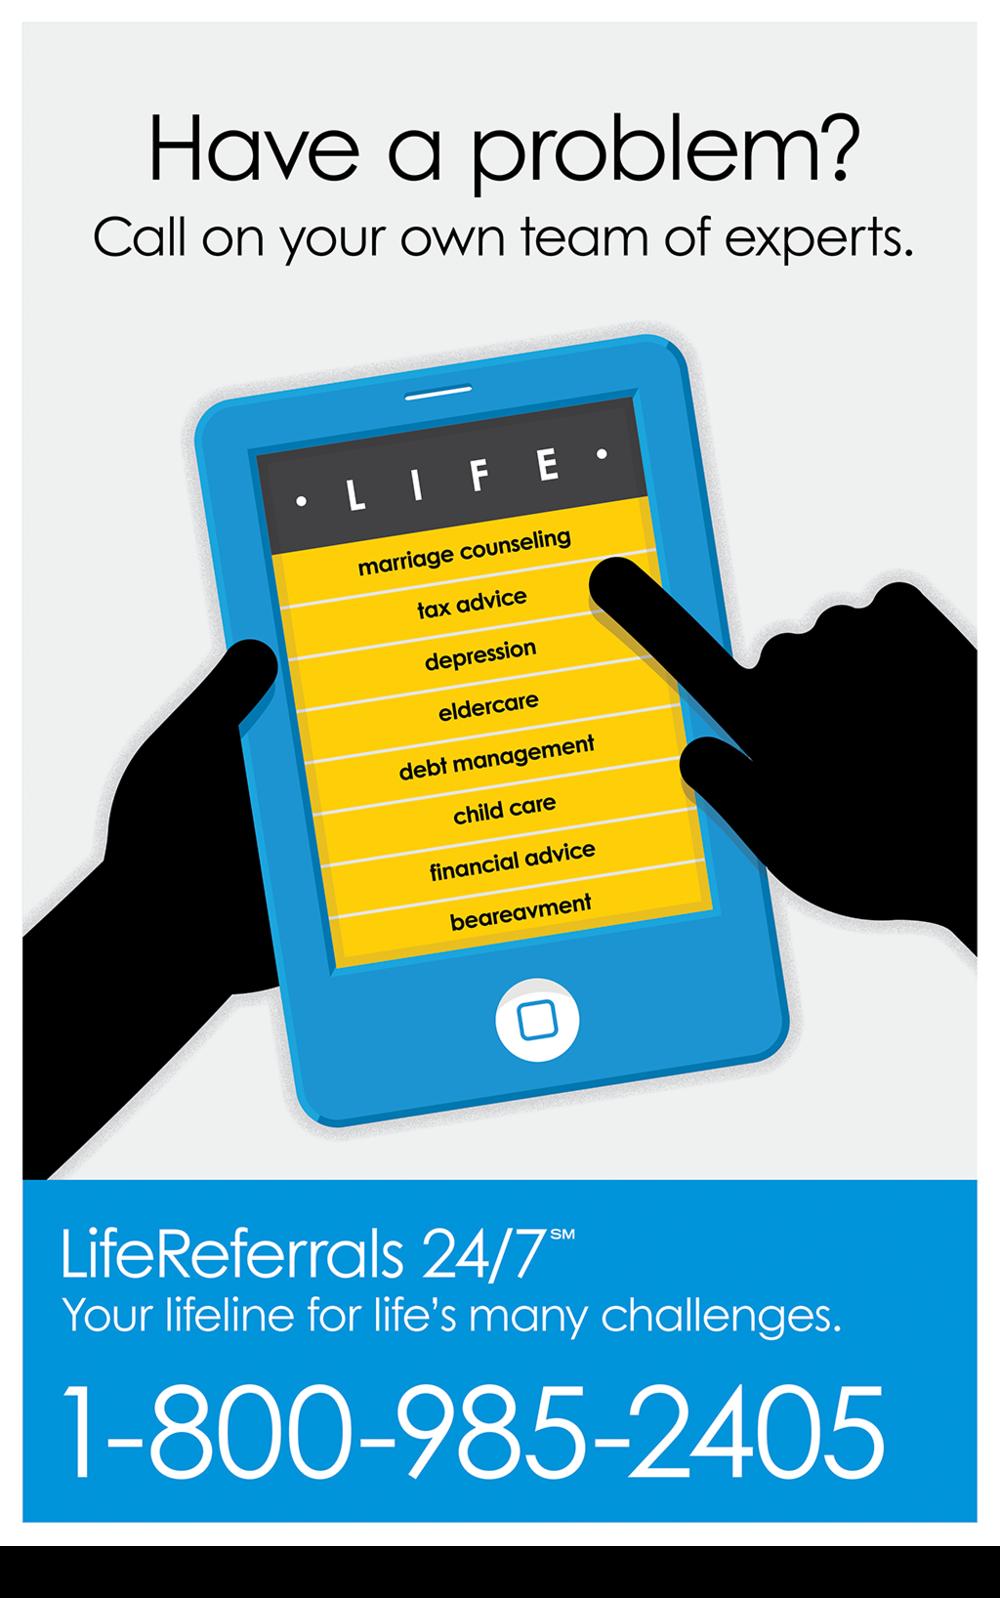 LifeReferrals_Poster3_1024x1582.jpg